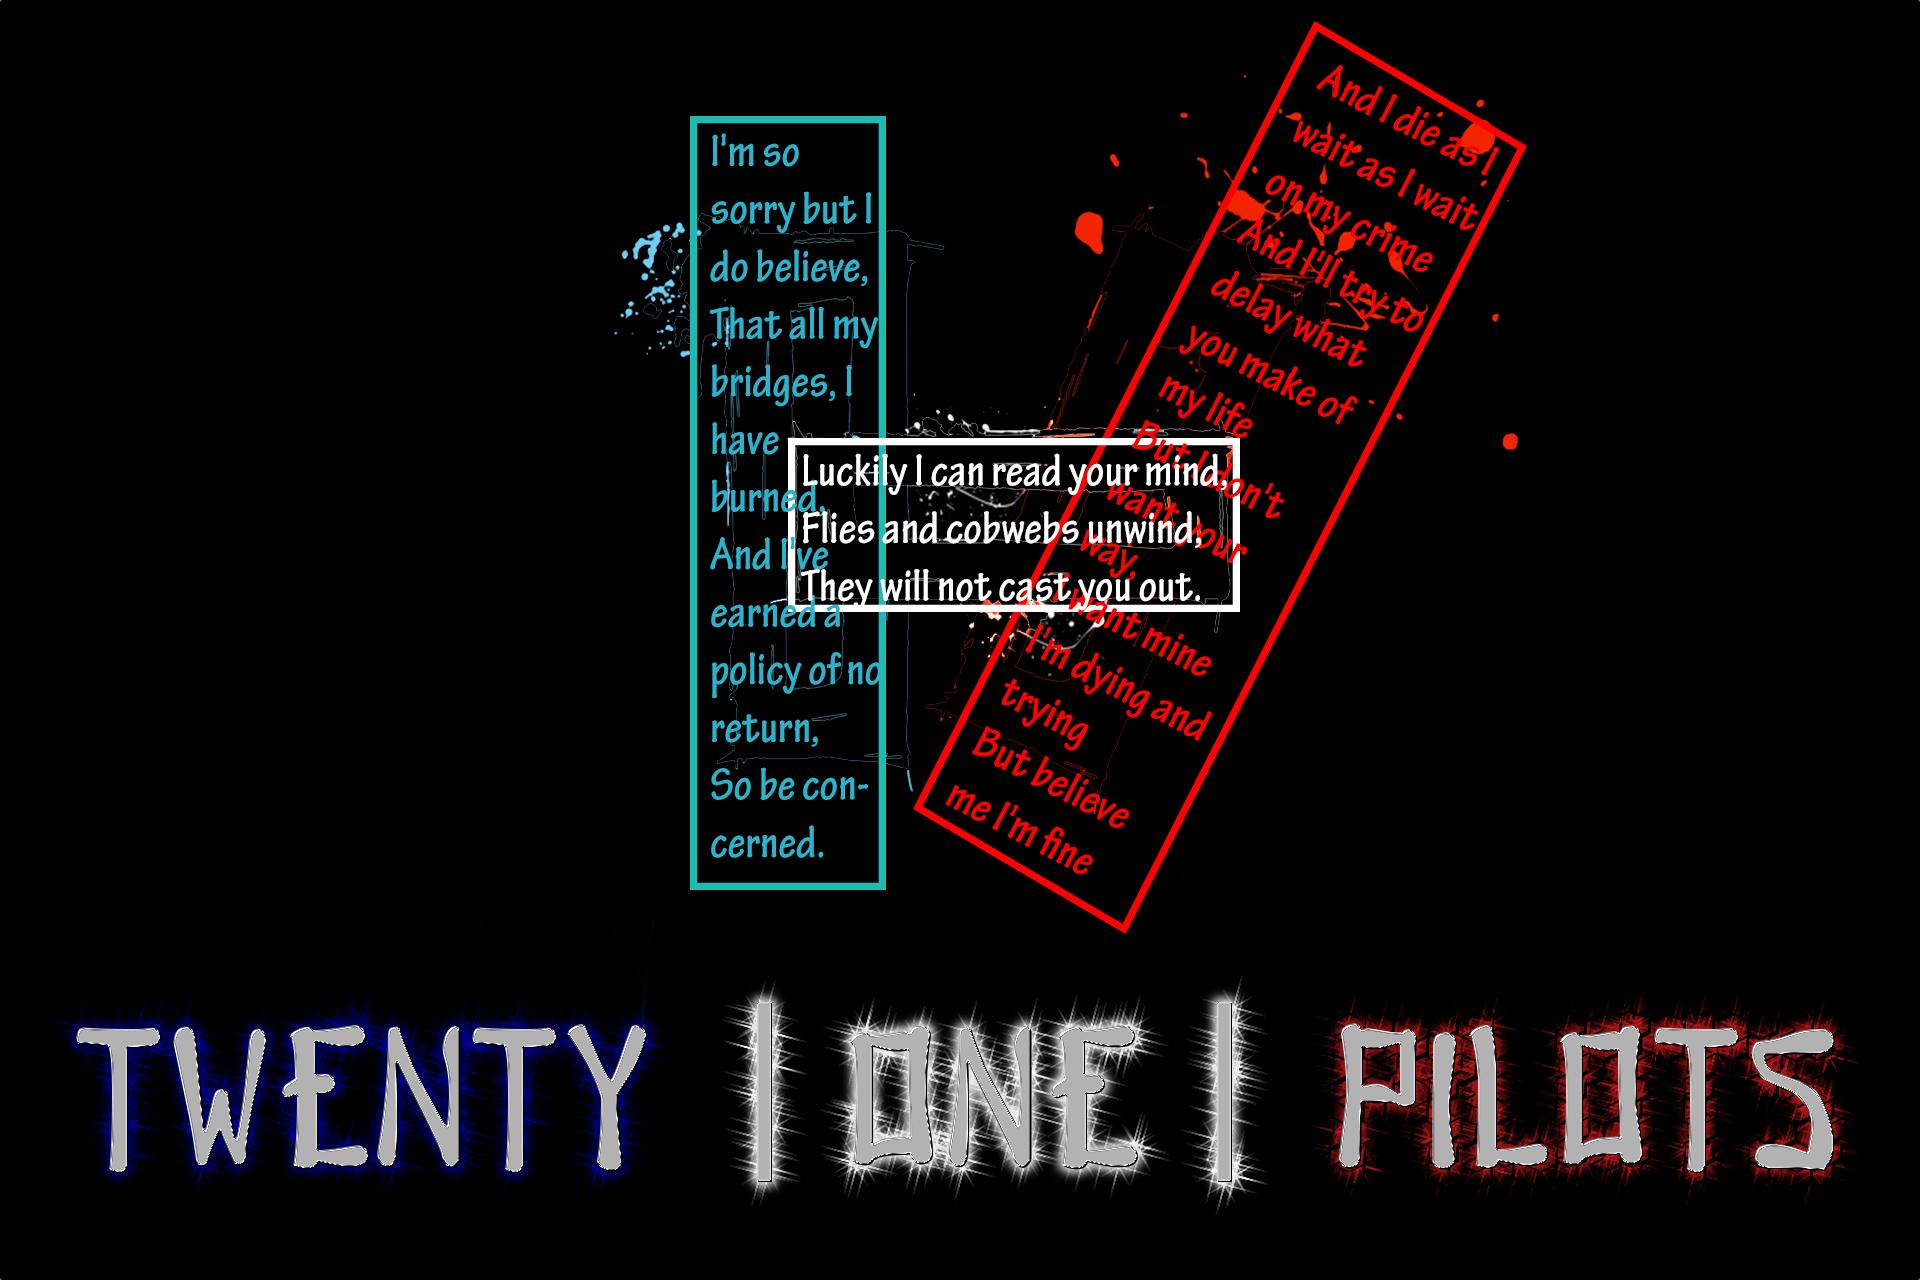 Twenty One Pilots Lyrics Wallpaper Wallpapersafari